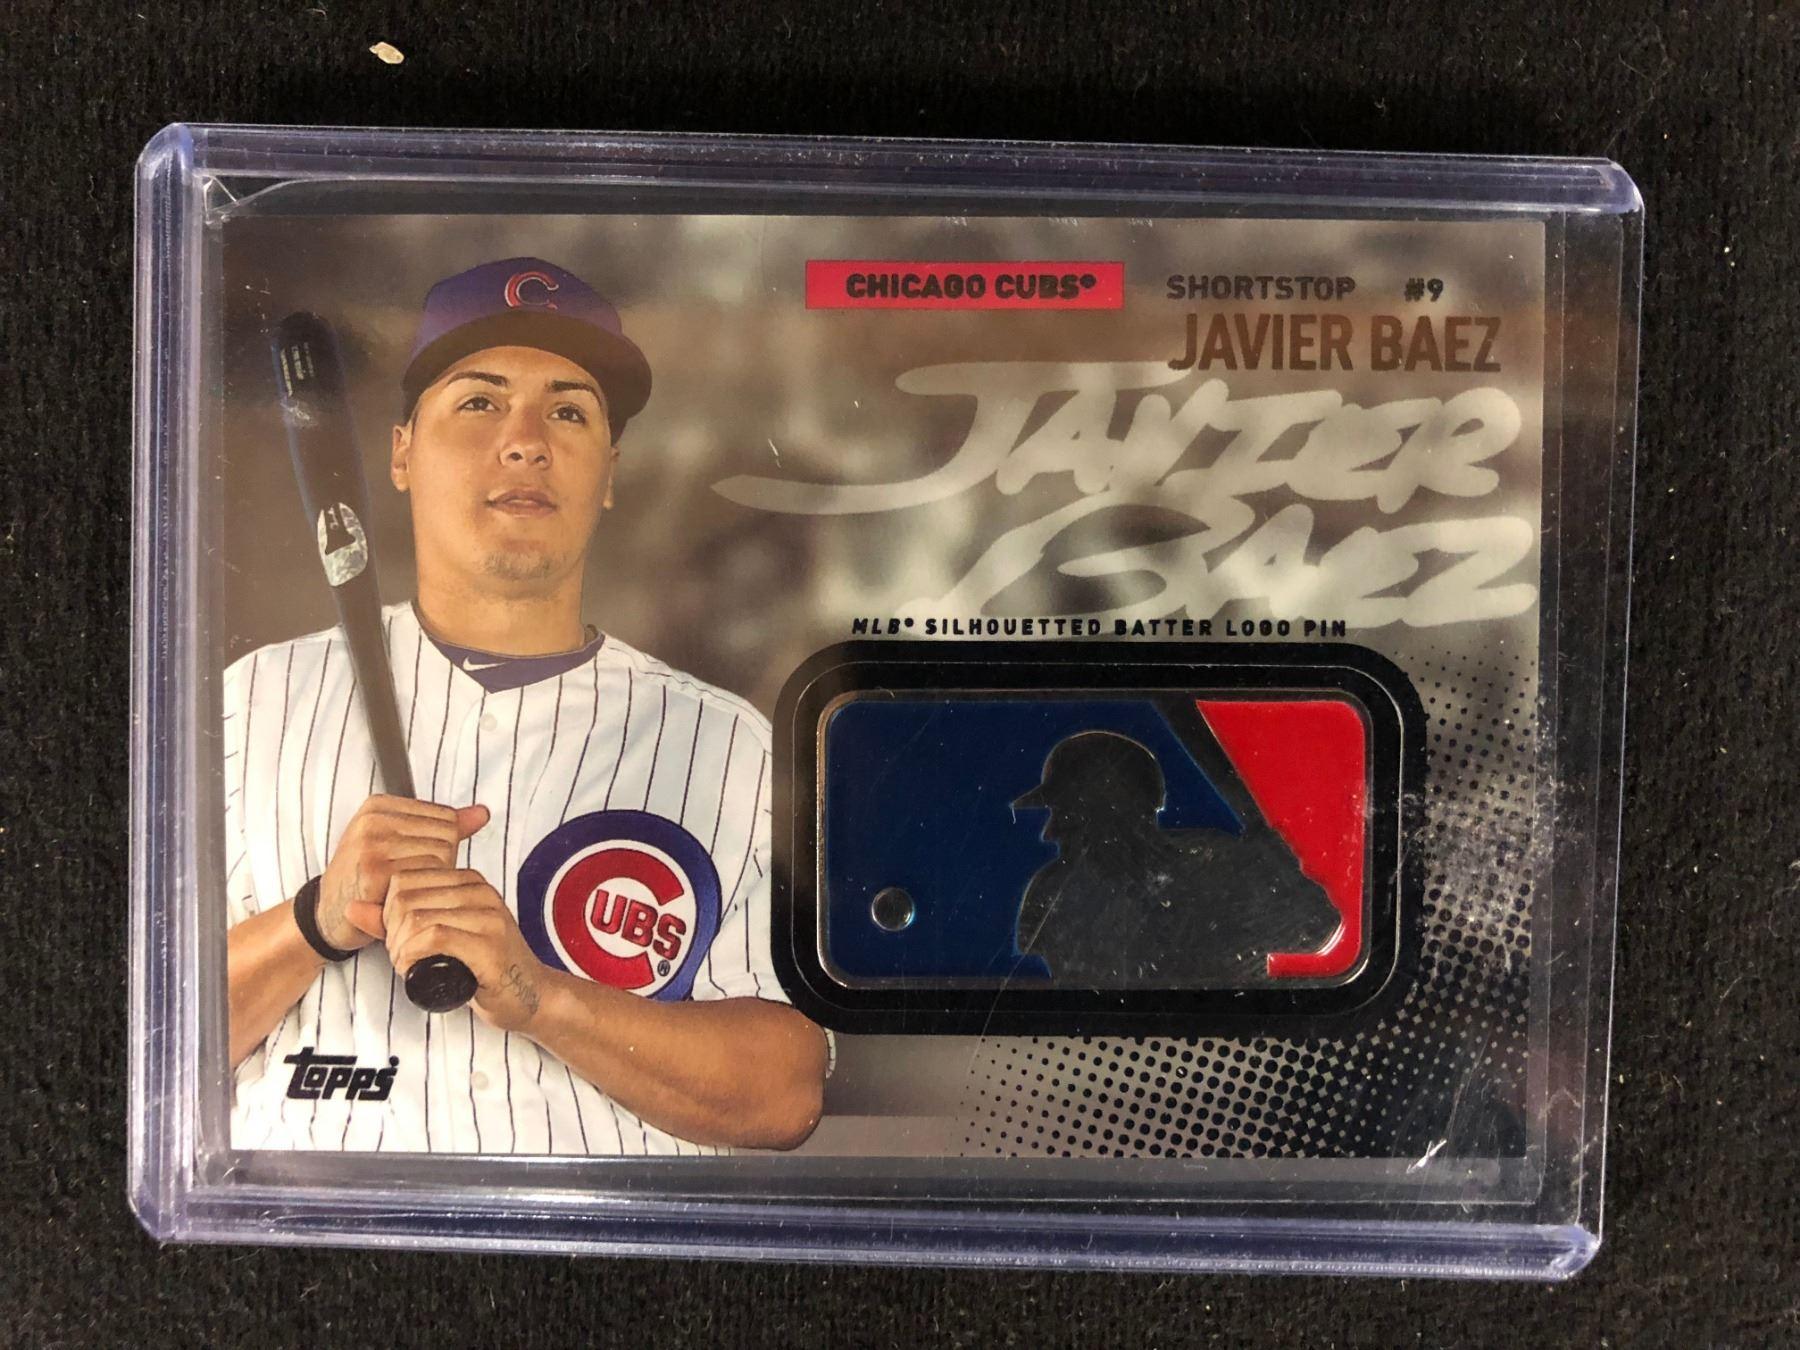 2015 Topps Msbl 18 Javier Baez Chicago Cubs Rookie Baseball Card